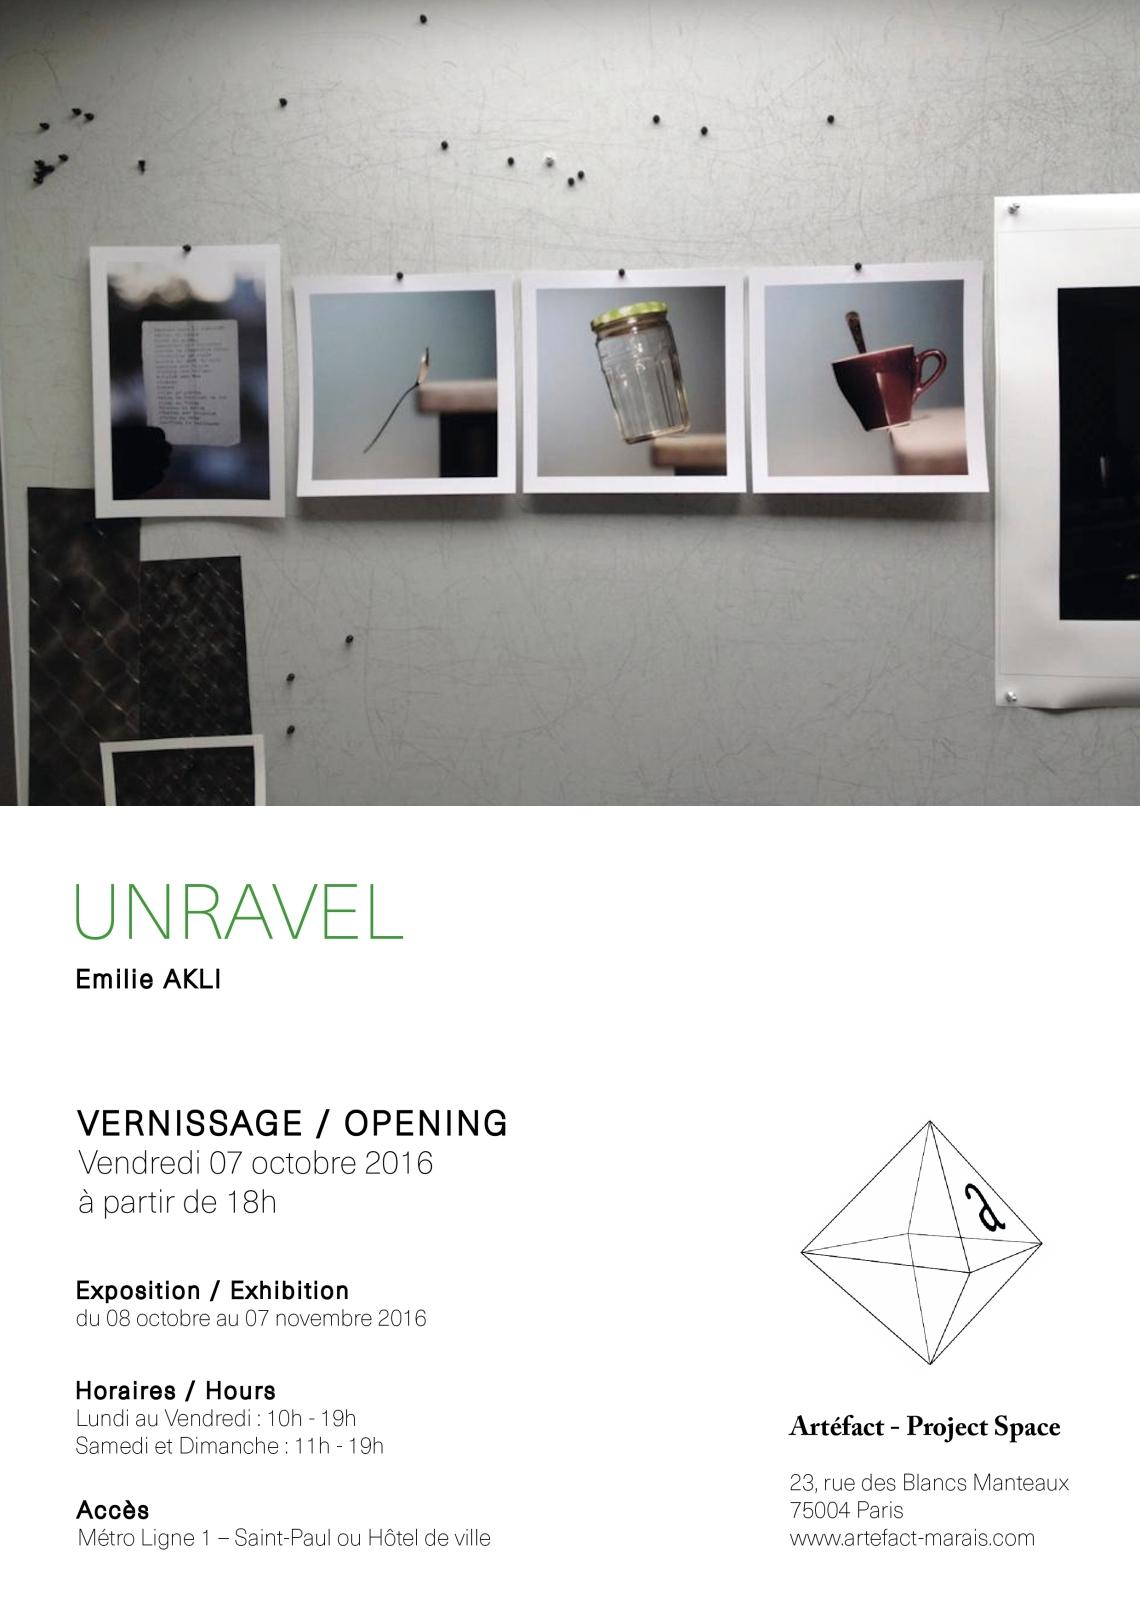 unravel-emilie-akli-carton-web-a4